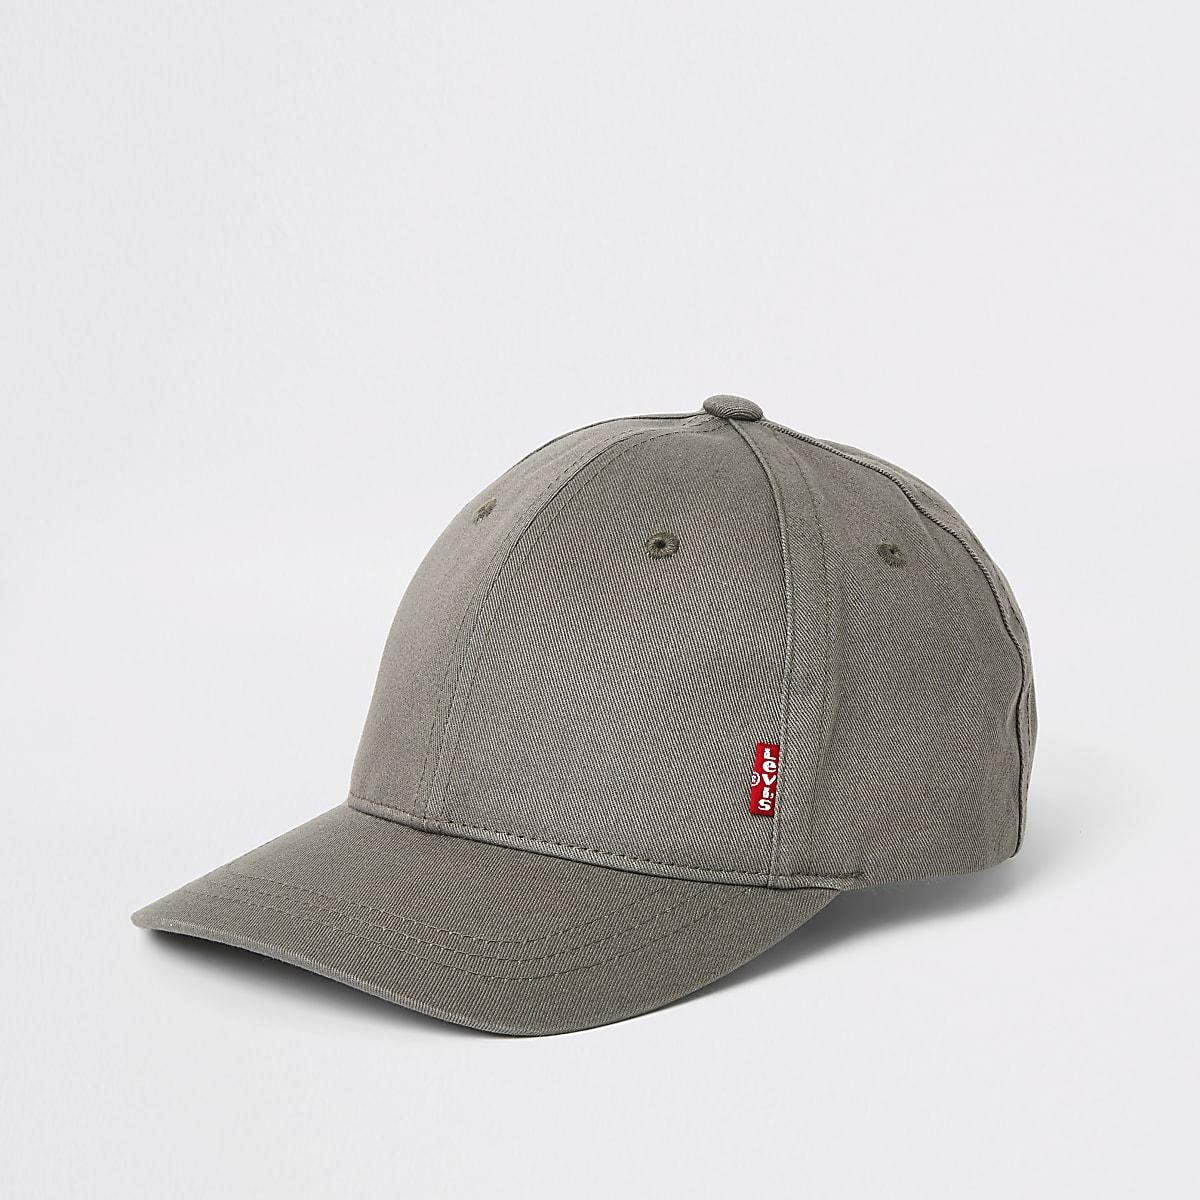 Levi's dark grey classic twill baseball cap